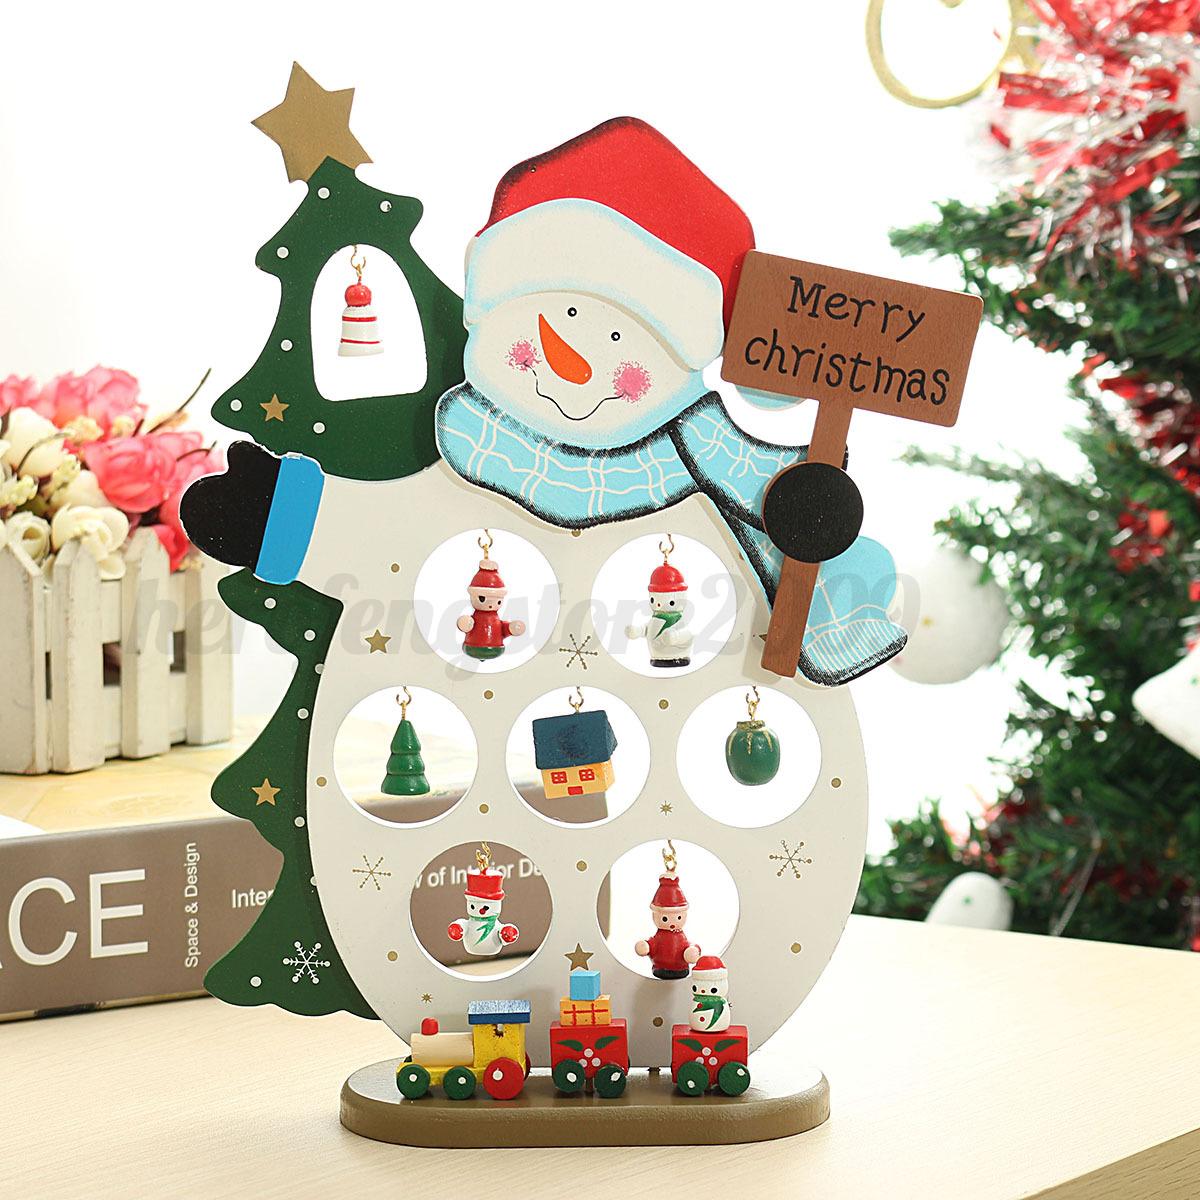 Wooden Snowman Santa Christmas Decoration Diy Assembling Home Decor Xmas Gift Ebay